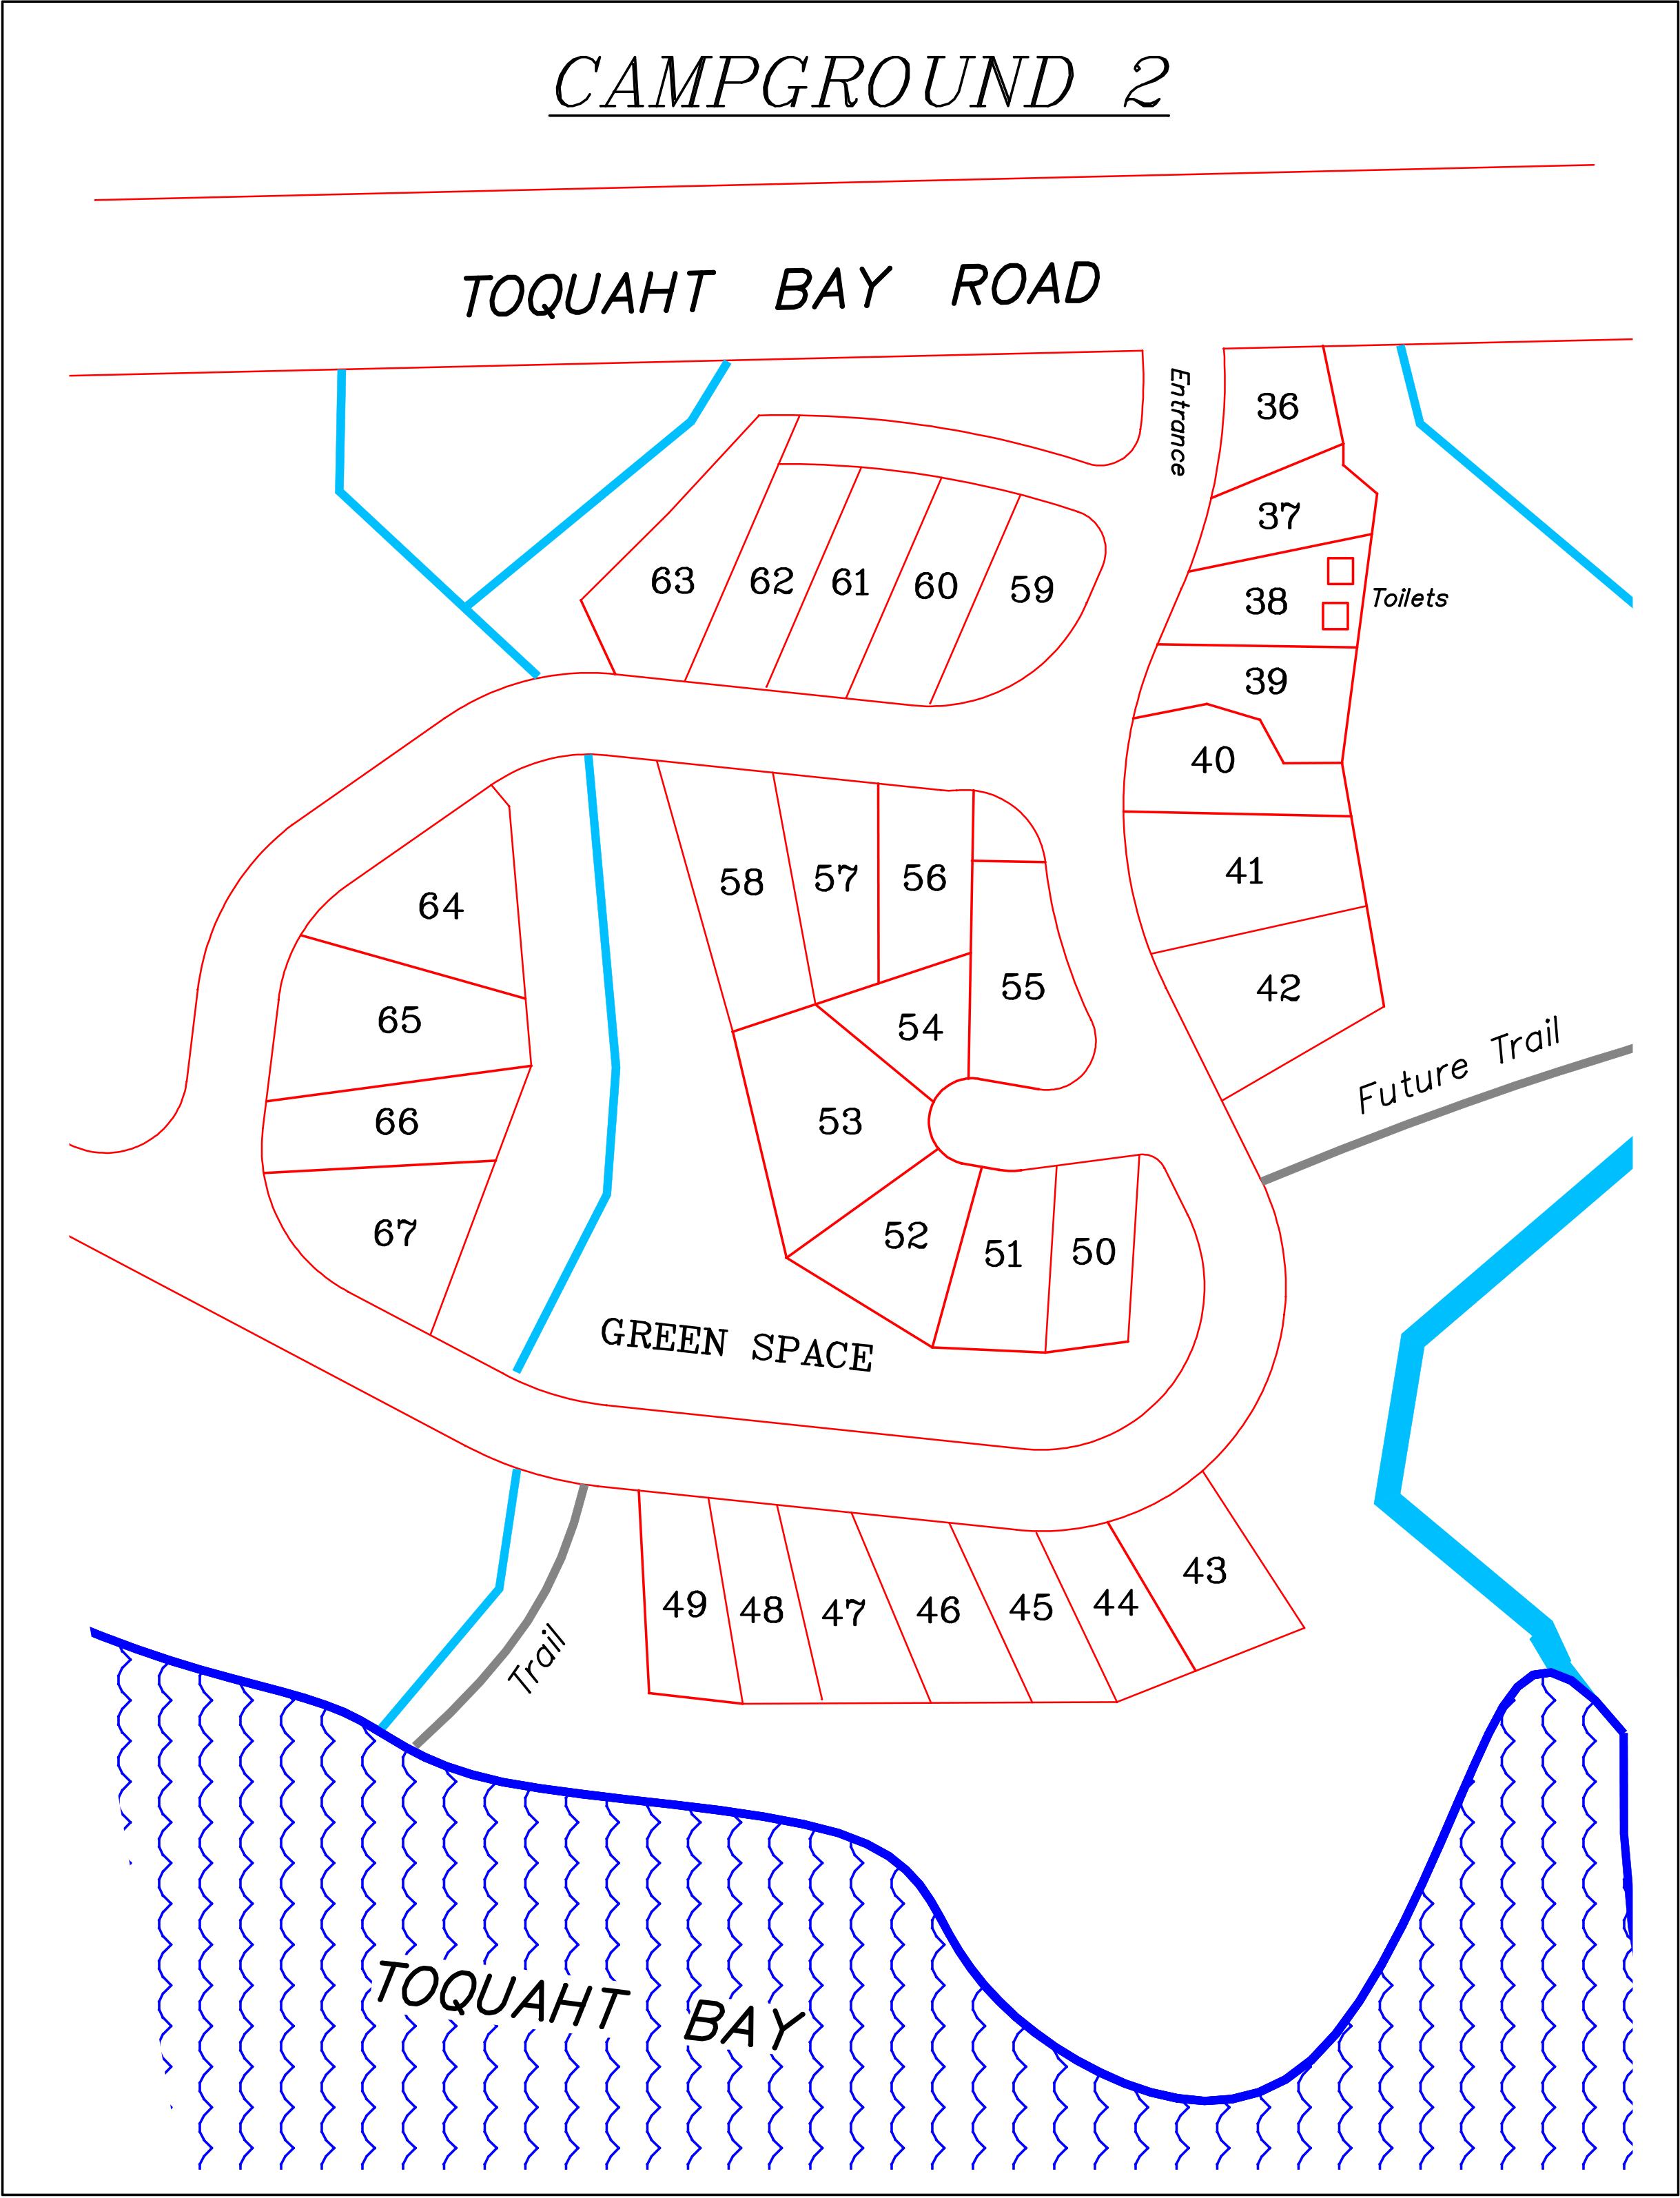 11-7279 Campground 2 Map.jpg